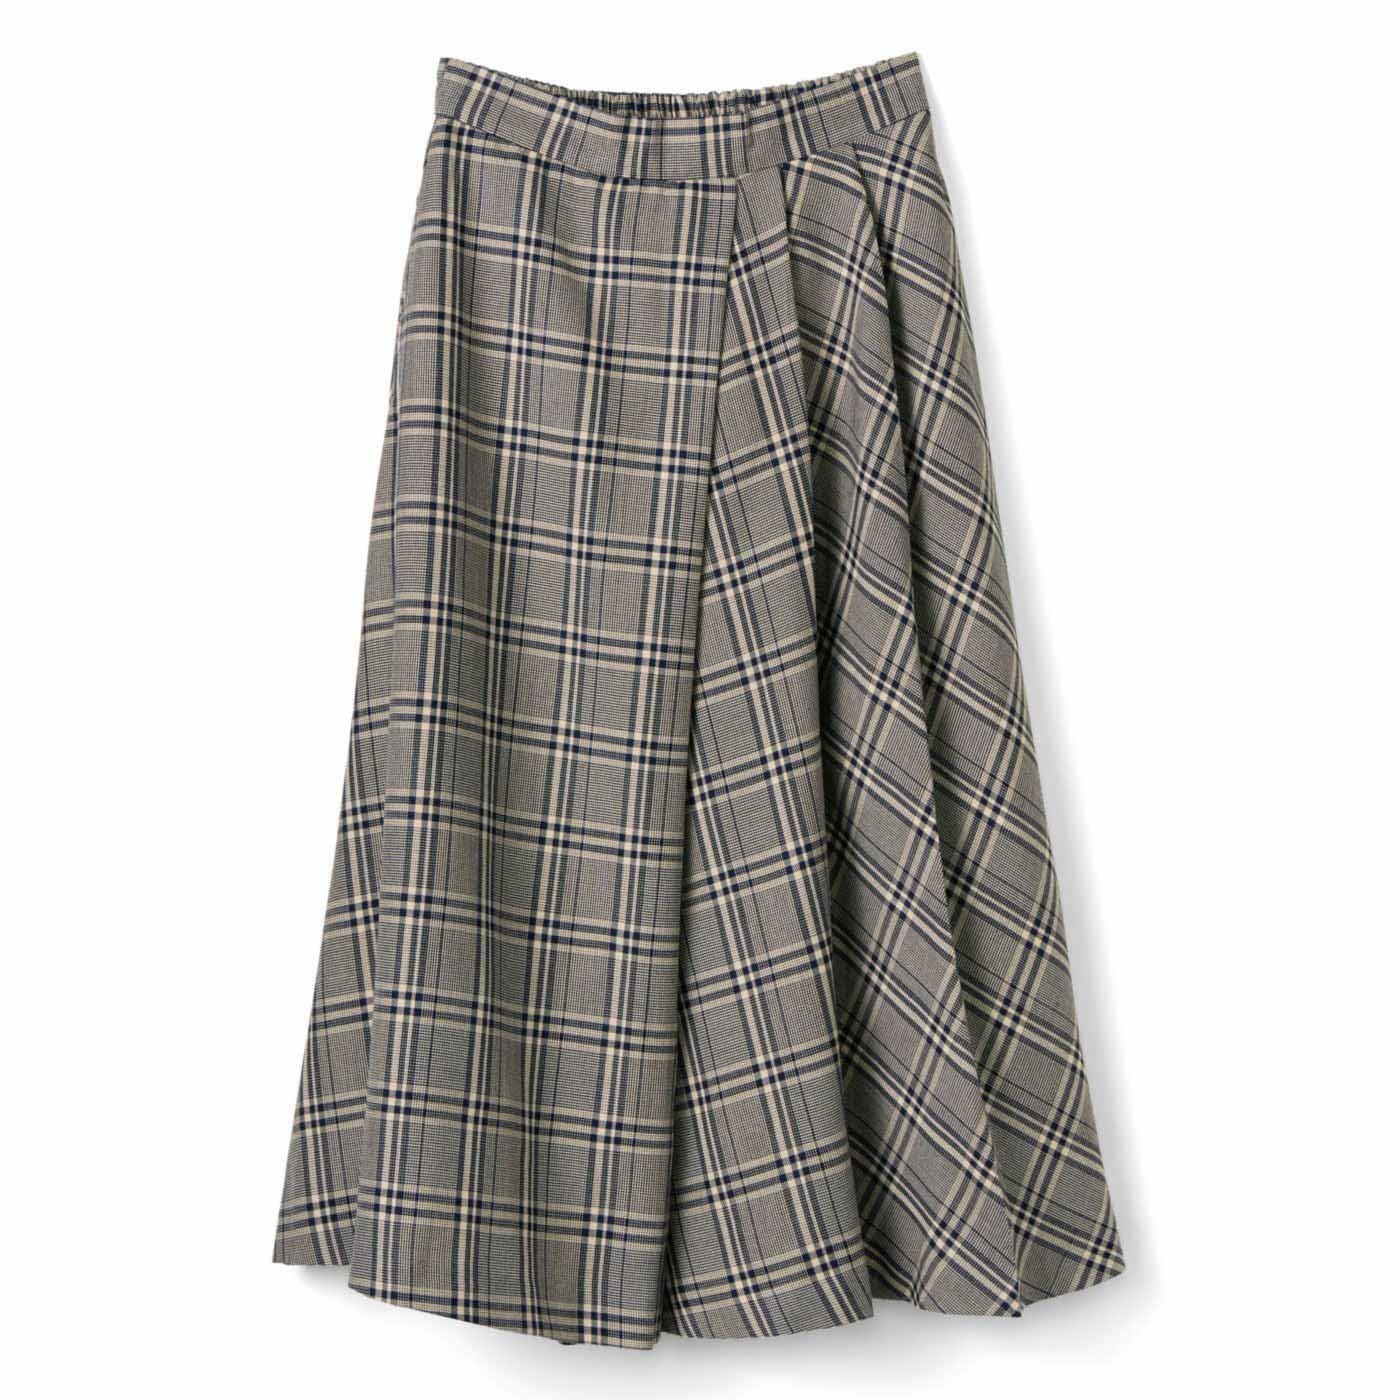 IEDIT[イディット] タックフレアーでチェックが美しく揺れ動く大人の着映えスカート〈ブラウン〉